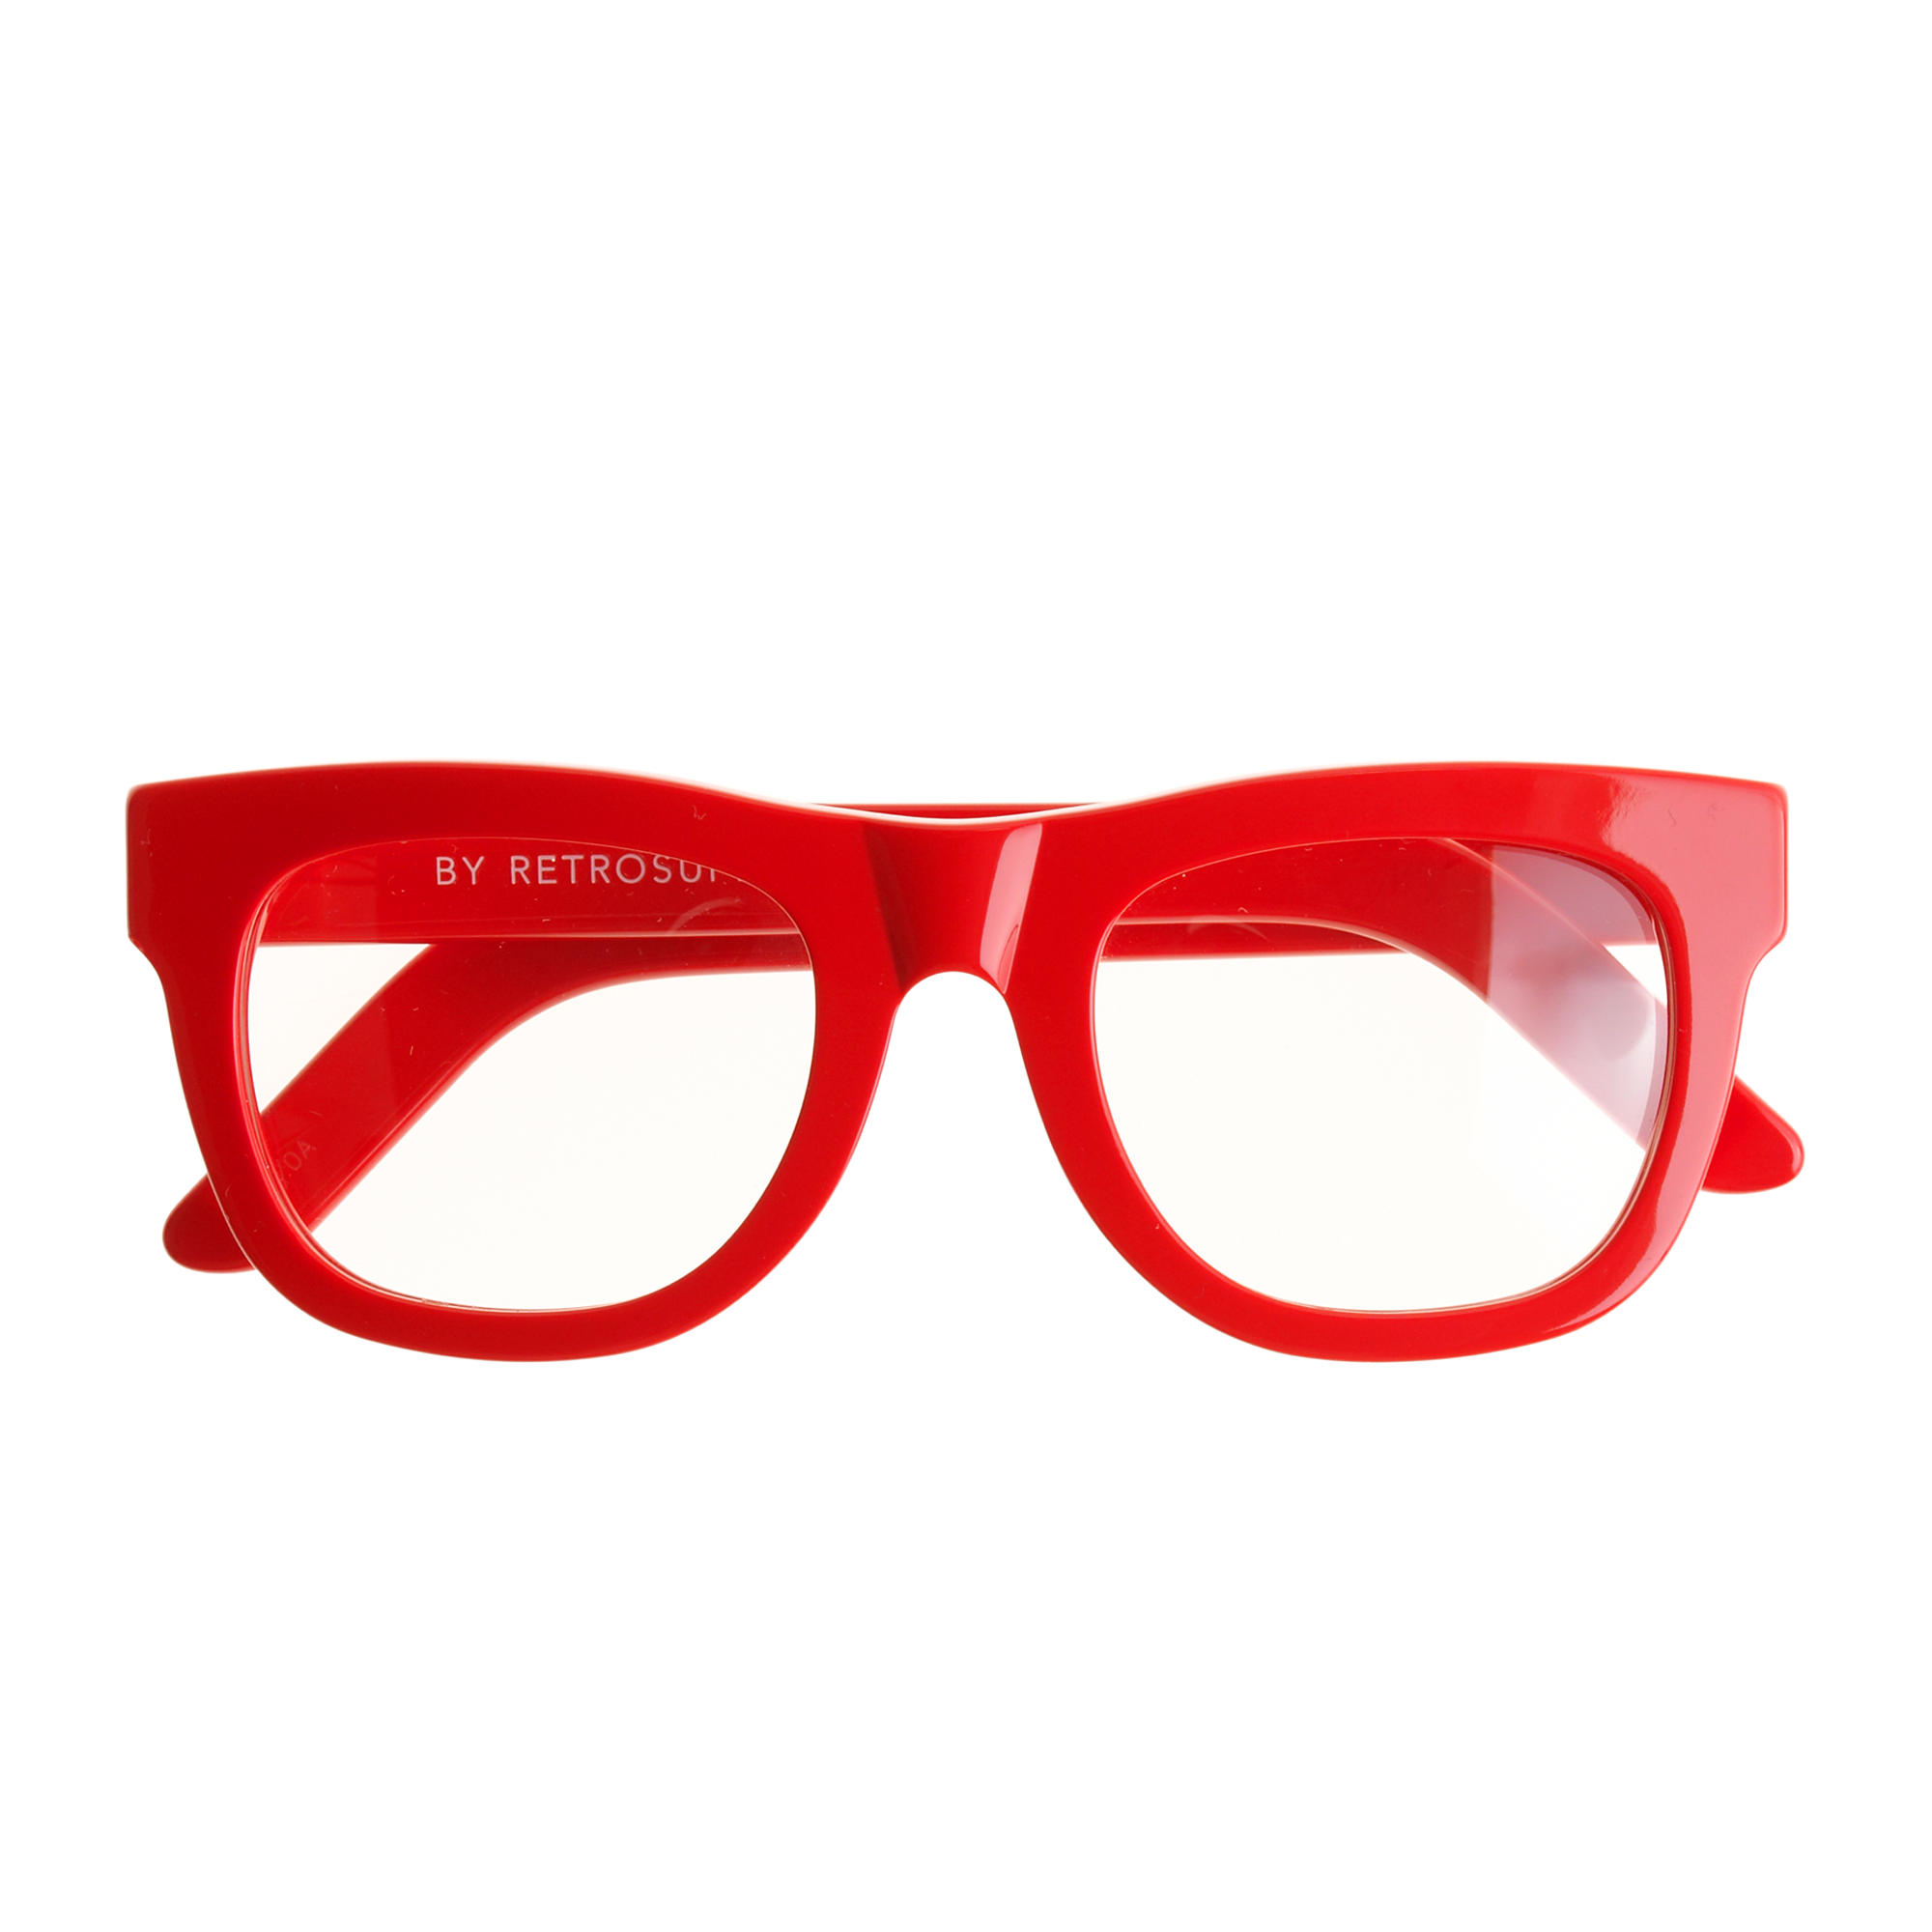 J Crew Super Ciccio Eyeglasses In Red Lyst